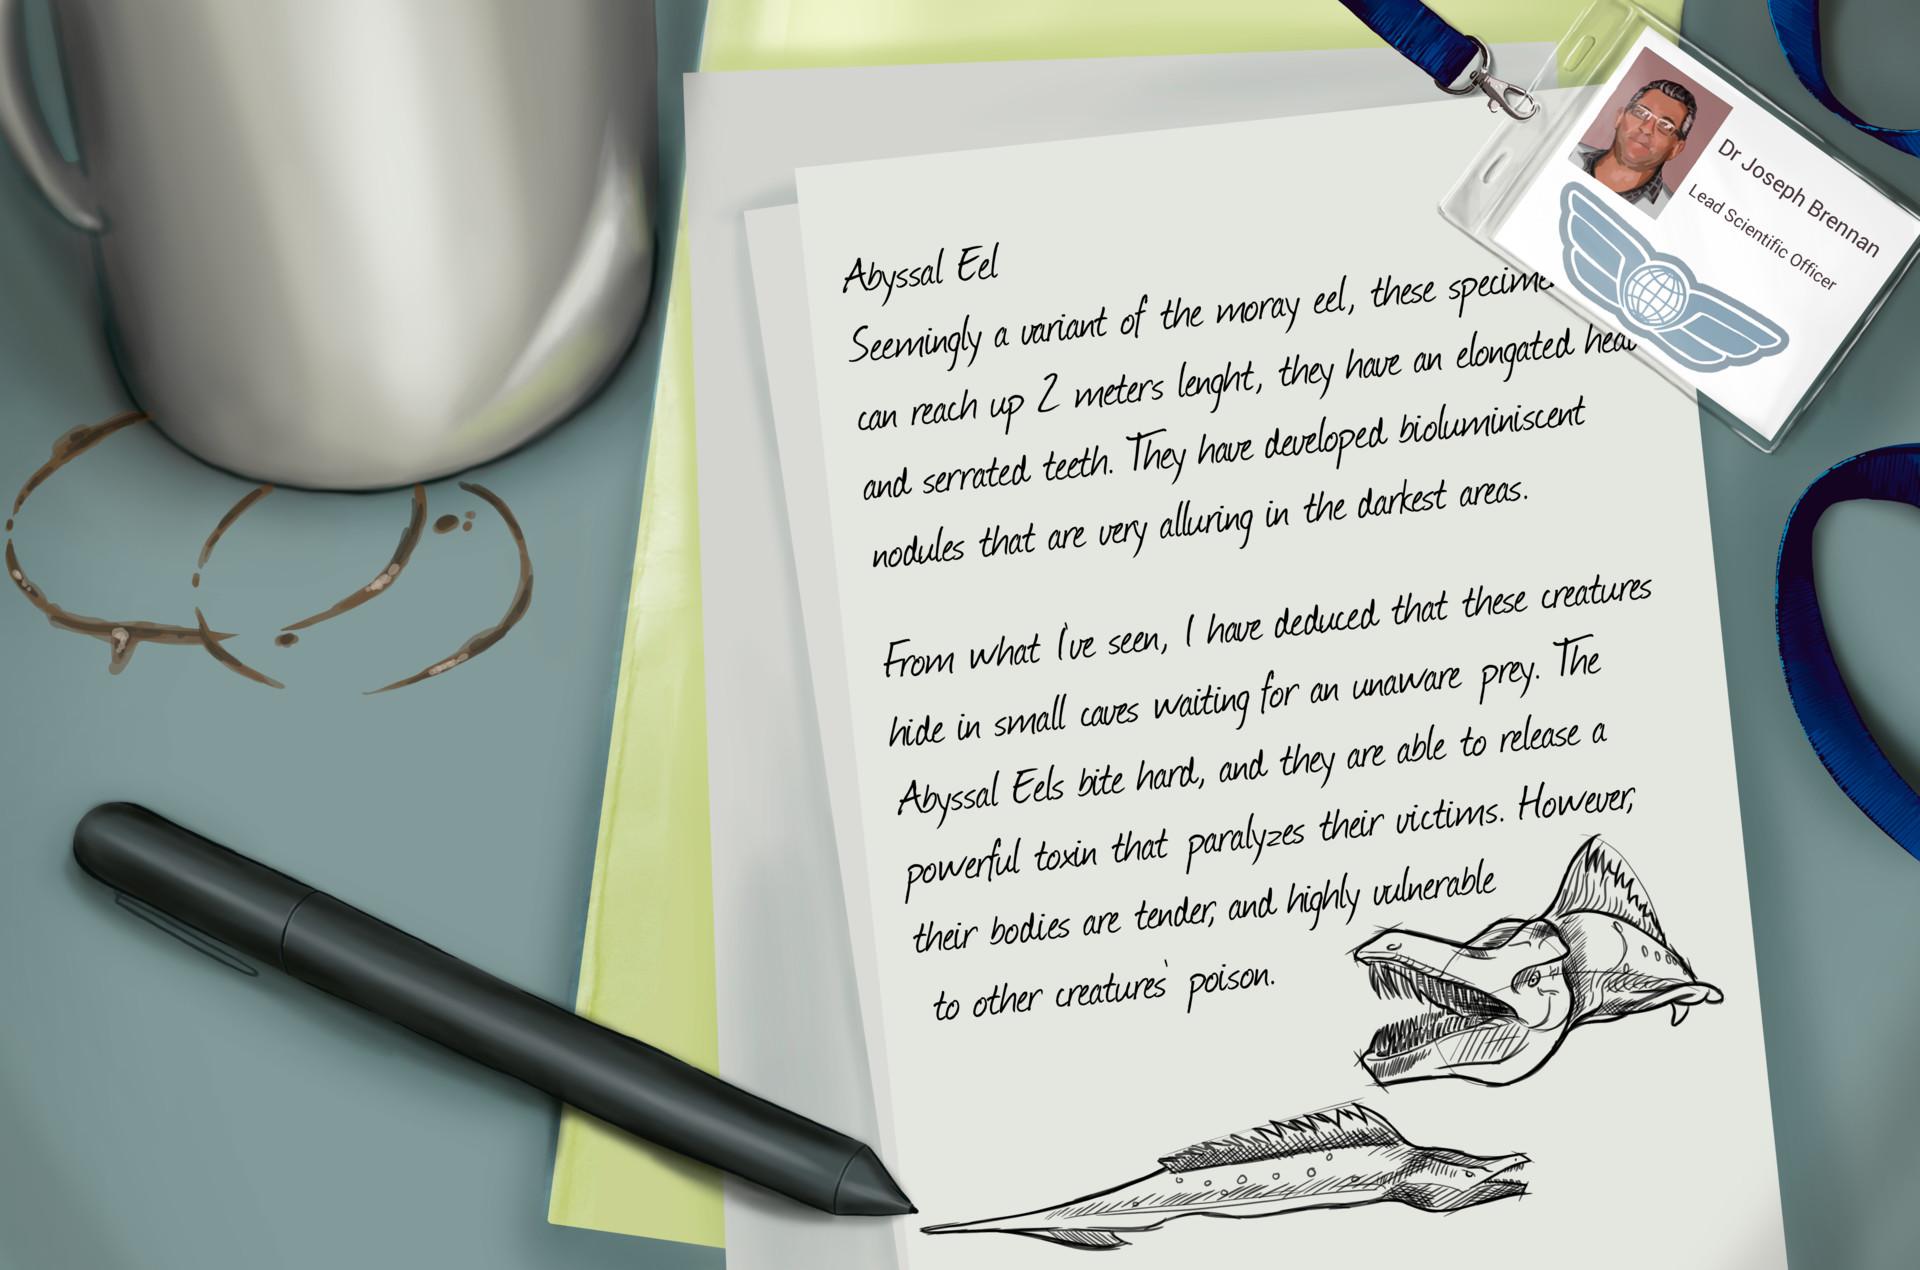 Saida granero parra brennan nota anguila